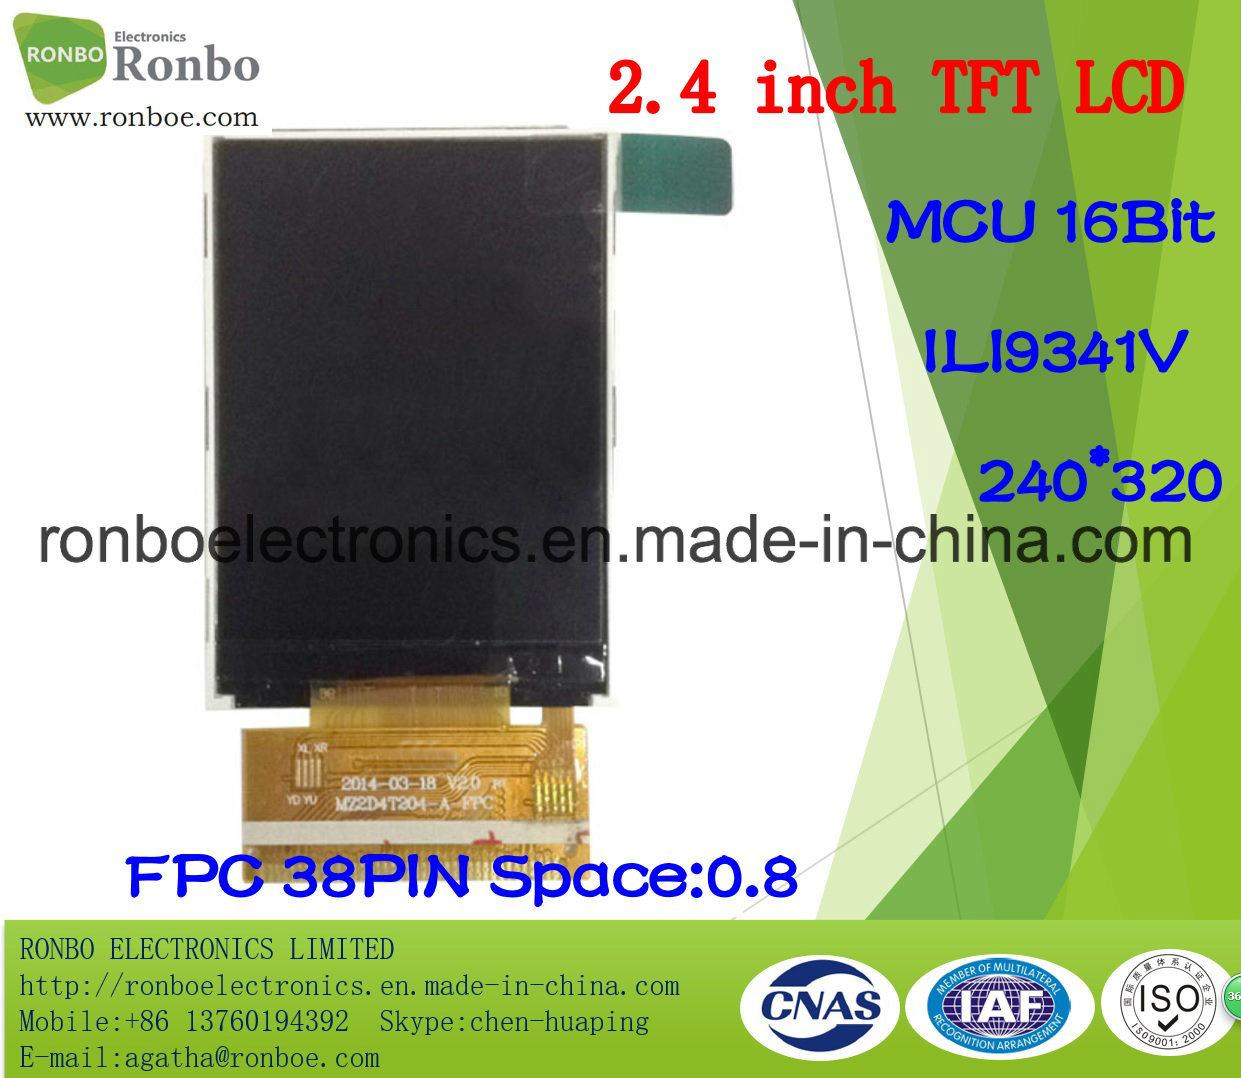 "2.4"" 240X320 MCU 16bit 38pin TFT LCD Module for POS, Doorbell, Medical"